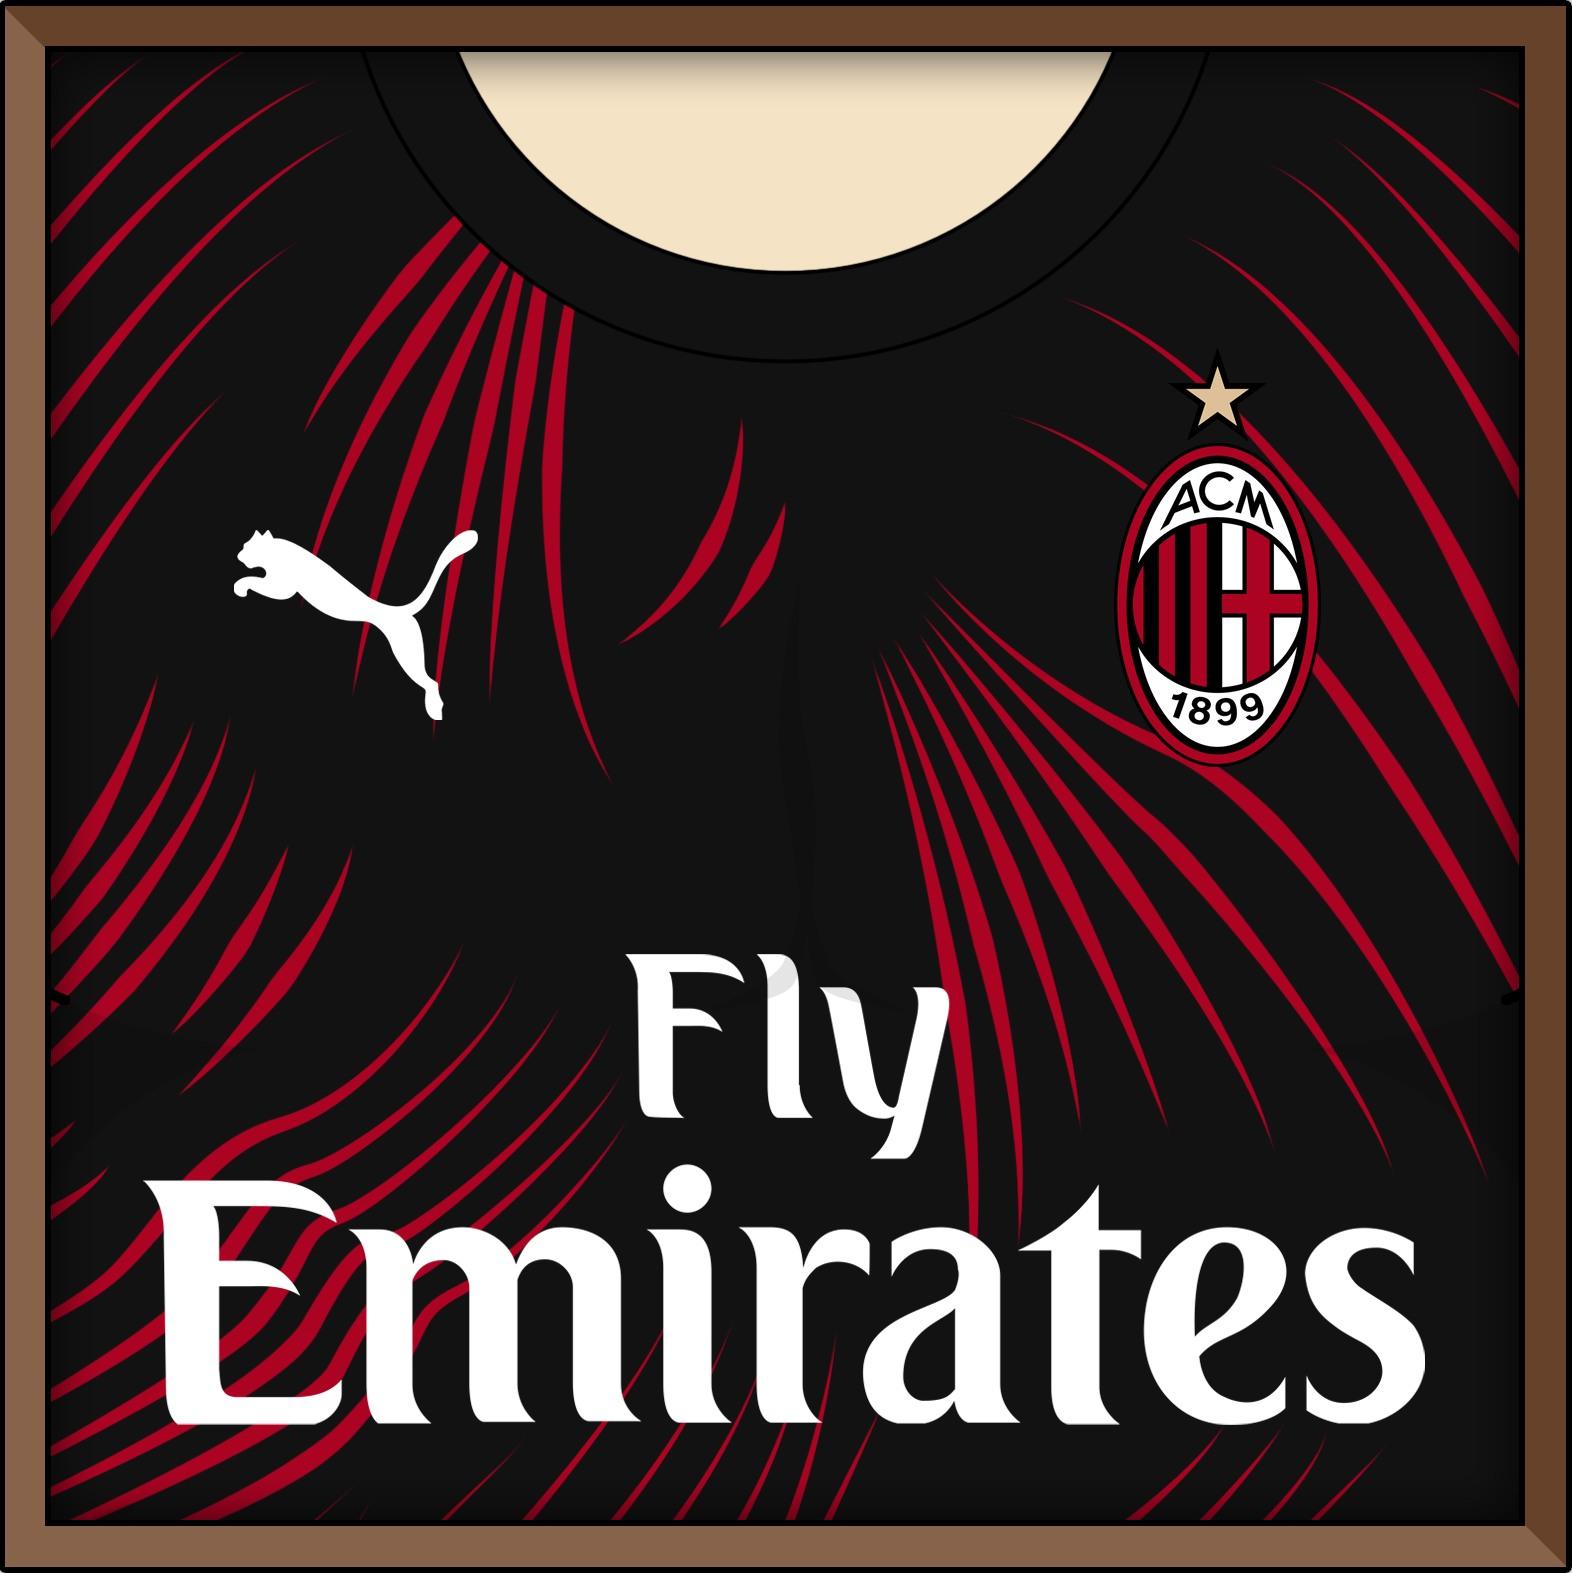 timeless design 4b39e 2997a AC Milan 2019-20 Third Kit Prediction | Kit design ...